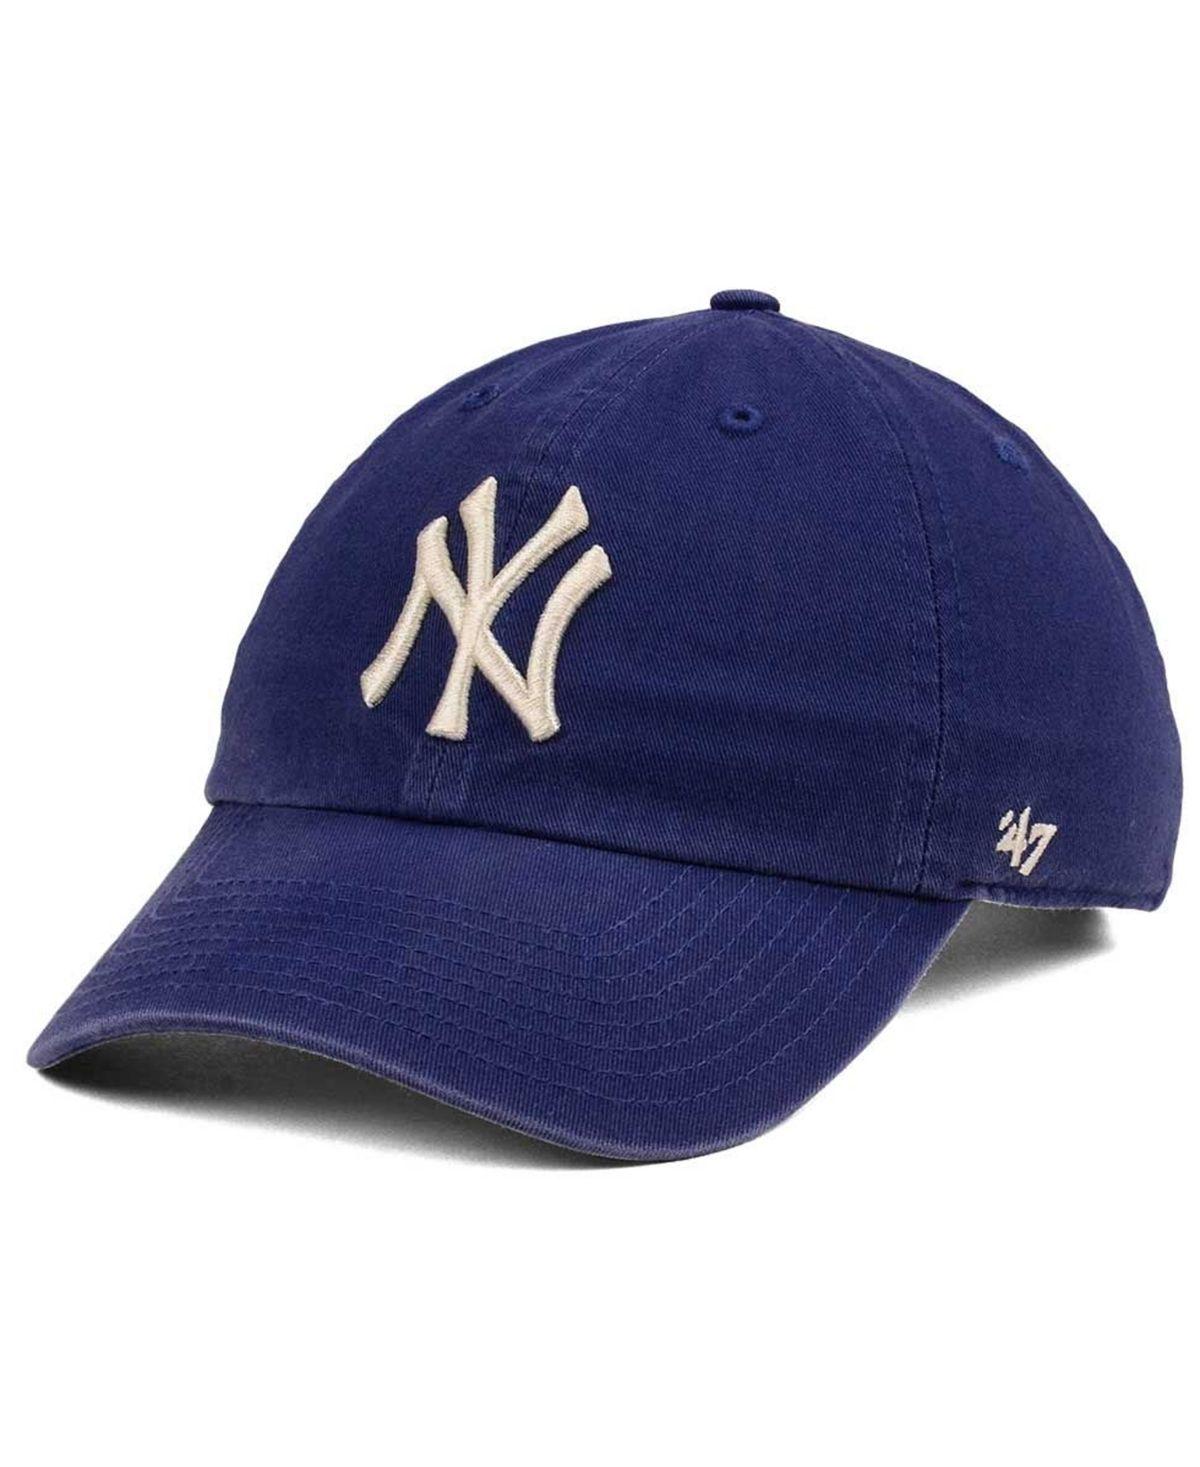 47 Brand New York Yankees Timber Blue Clean Up Cap Blue 47 Brand Trending Shoes Pumps Heels